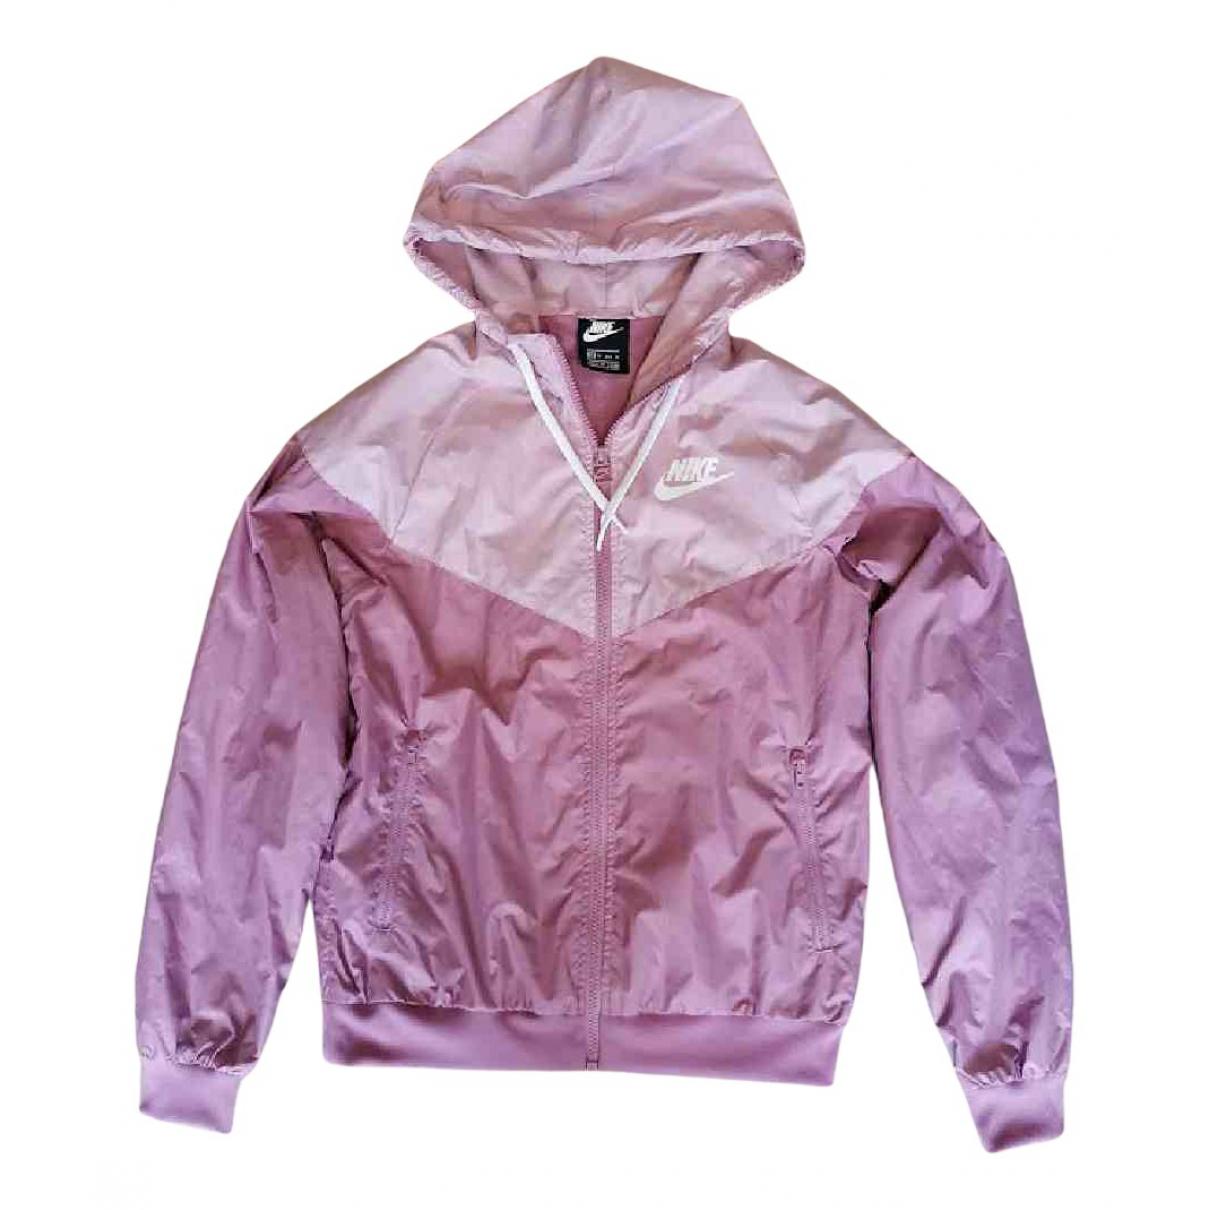 Nike N Pink jacket & coat for Kids 12 years - XS FR